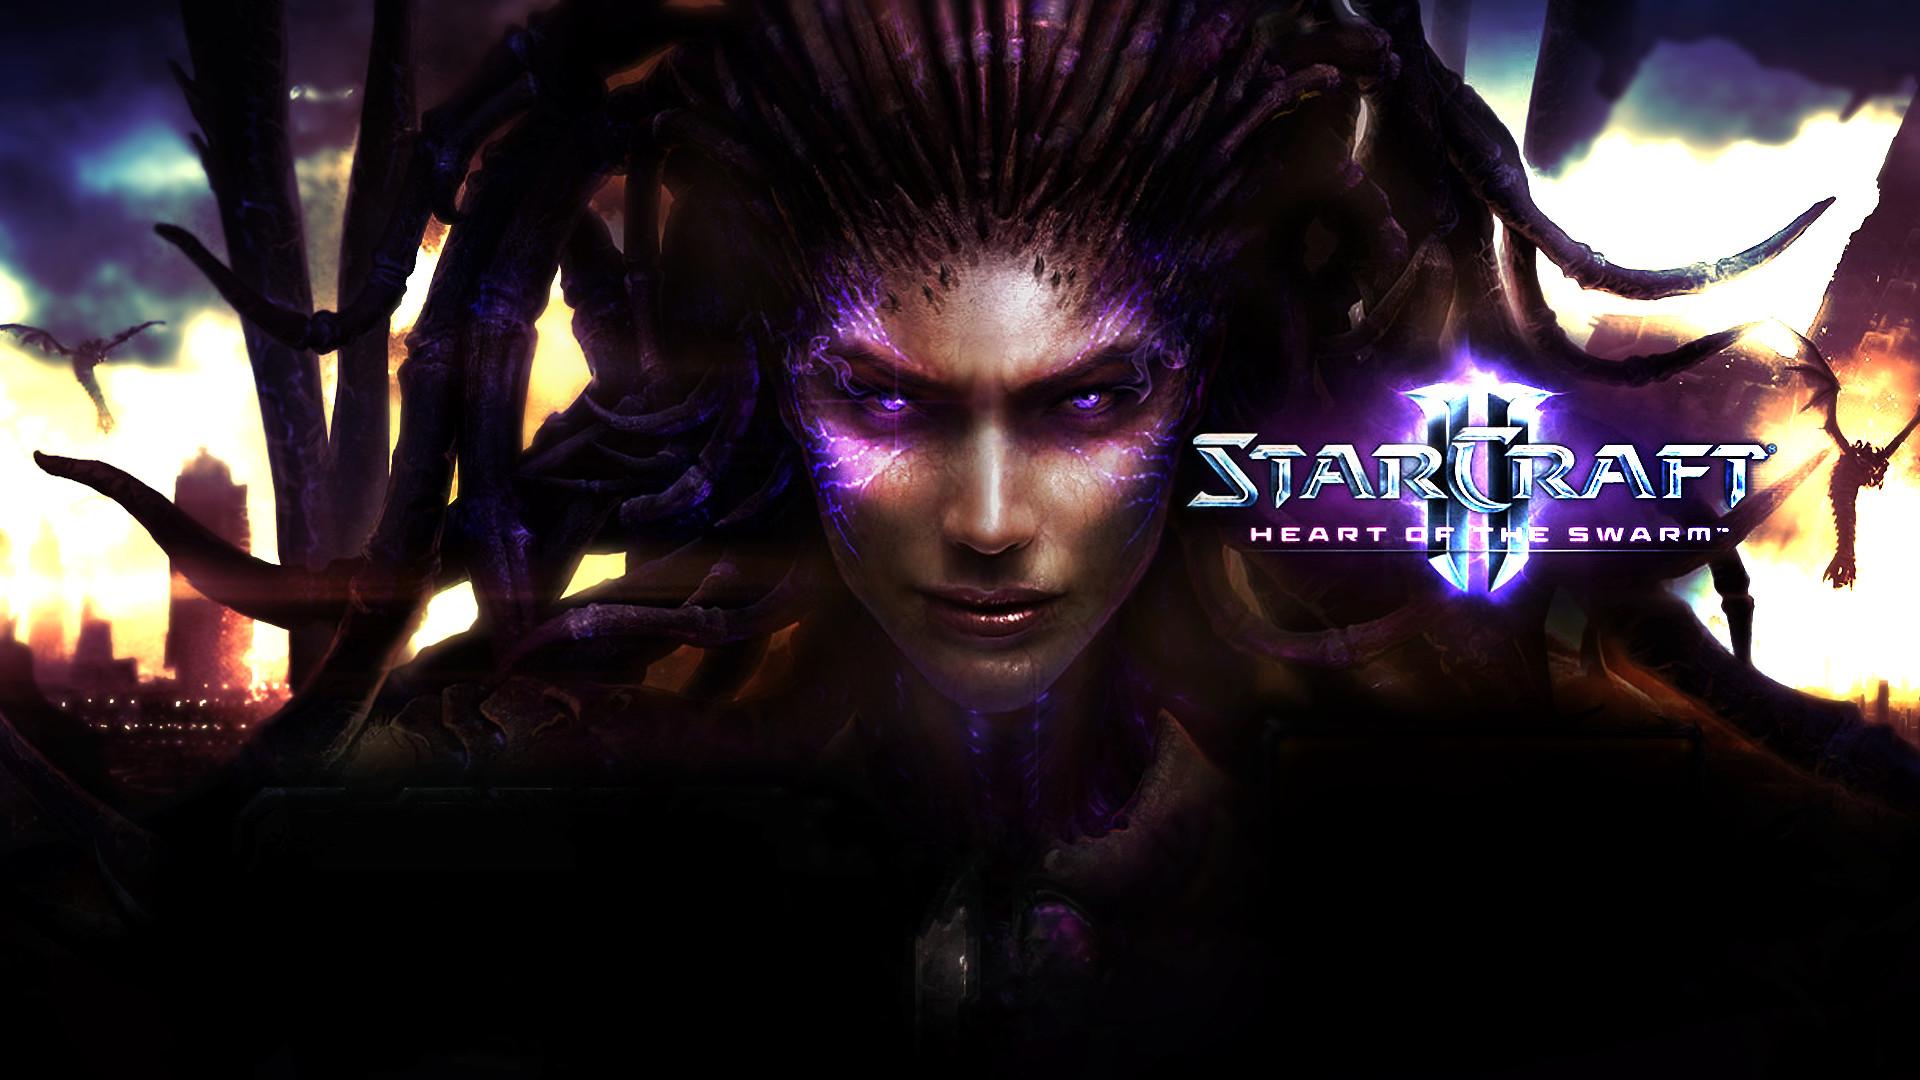 Video Game – StarCraft II: Heart of the Swarm Sarah Kerrigan Wallpaper